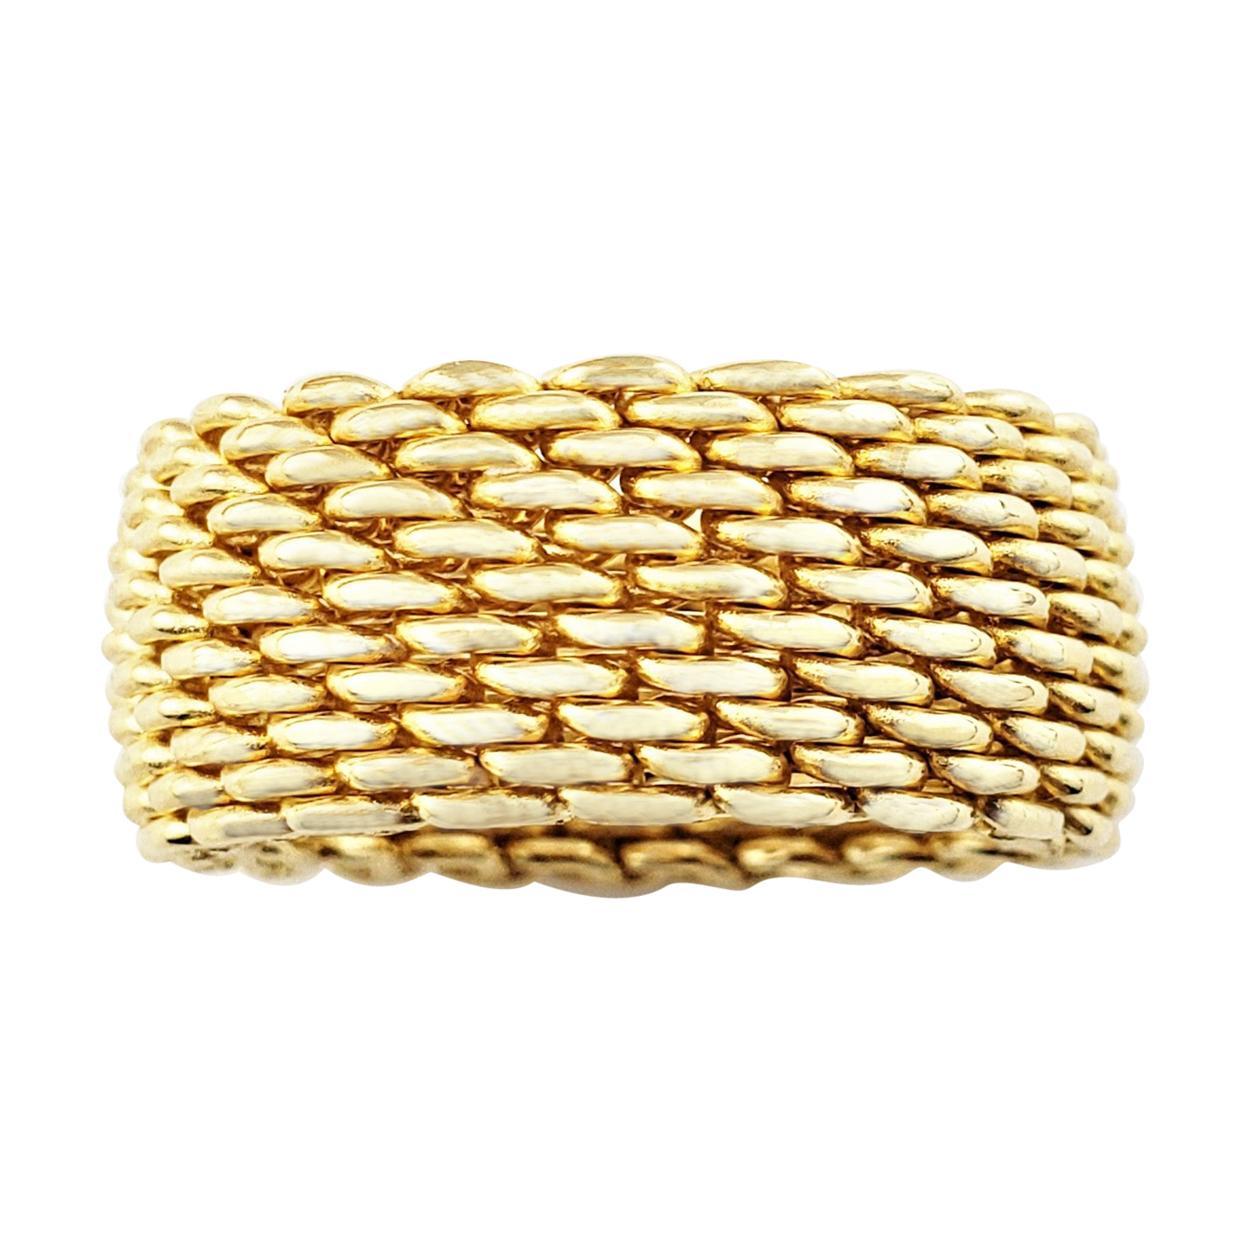 Vintage Tiffany & Co. 18 Karat Yellow Gold Mesh Band Ring